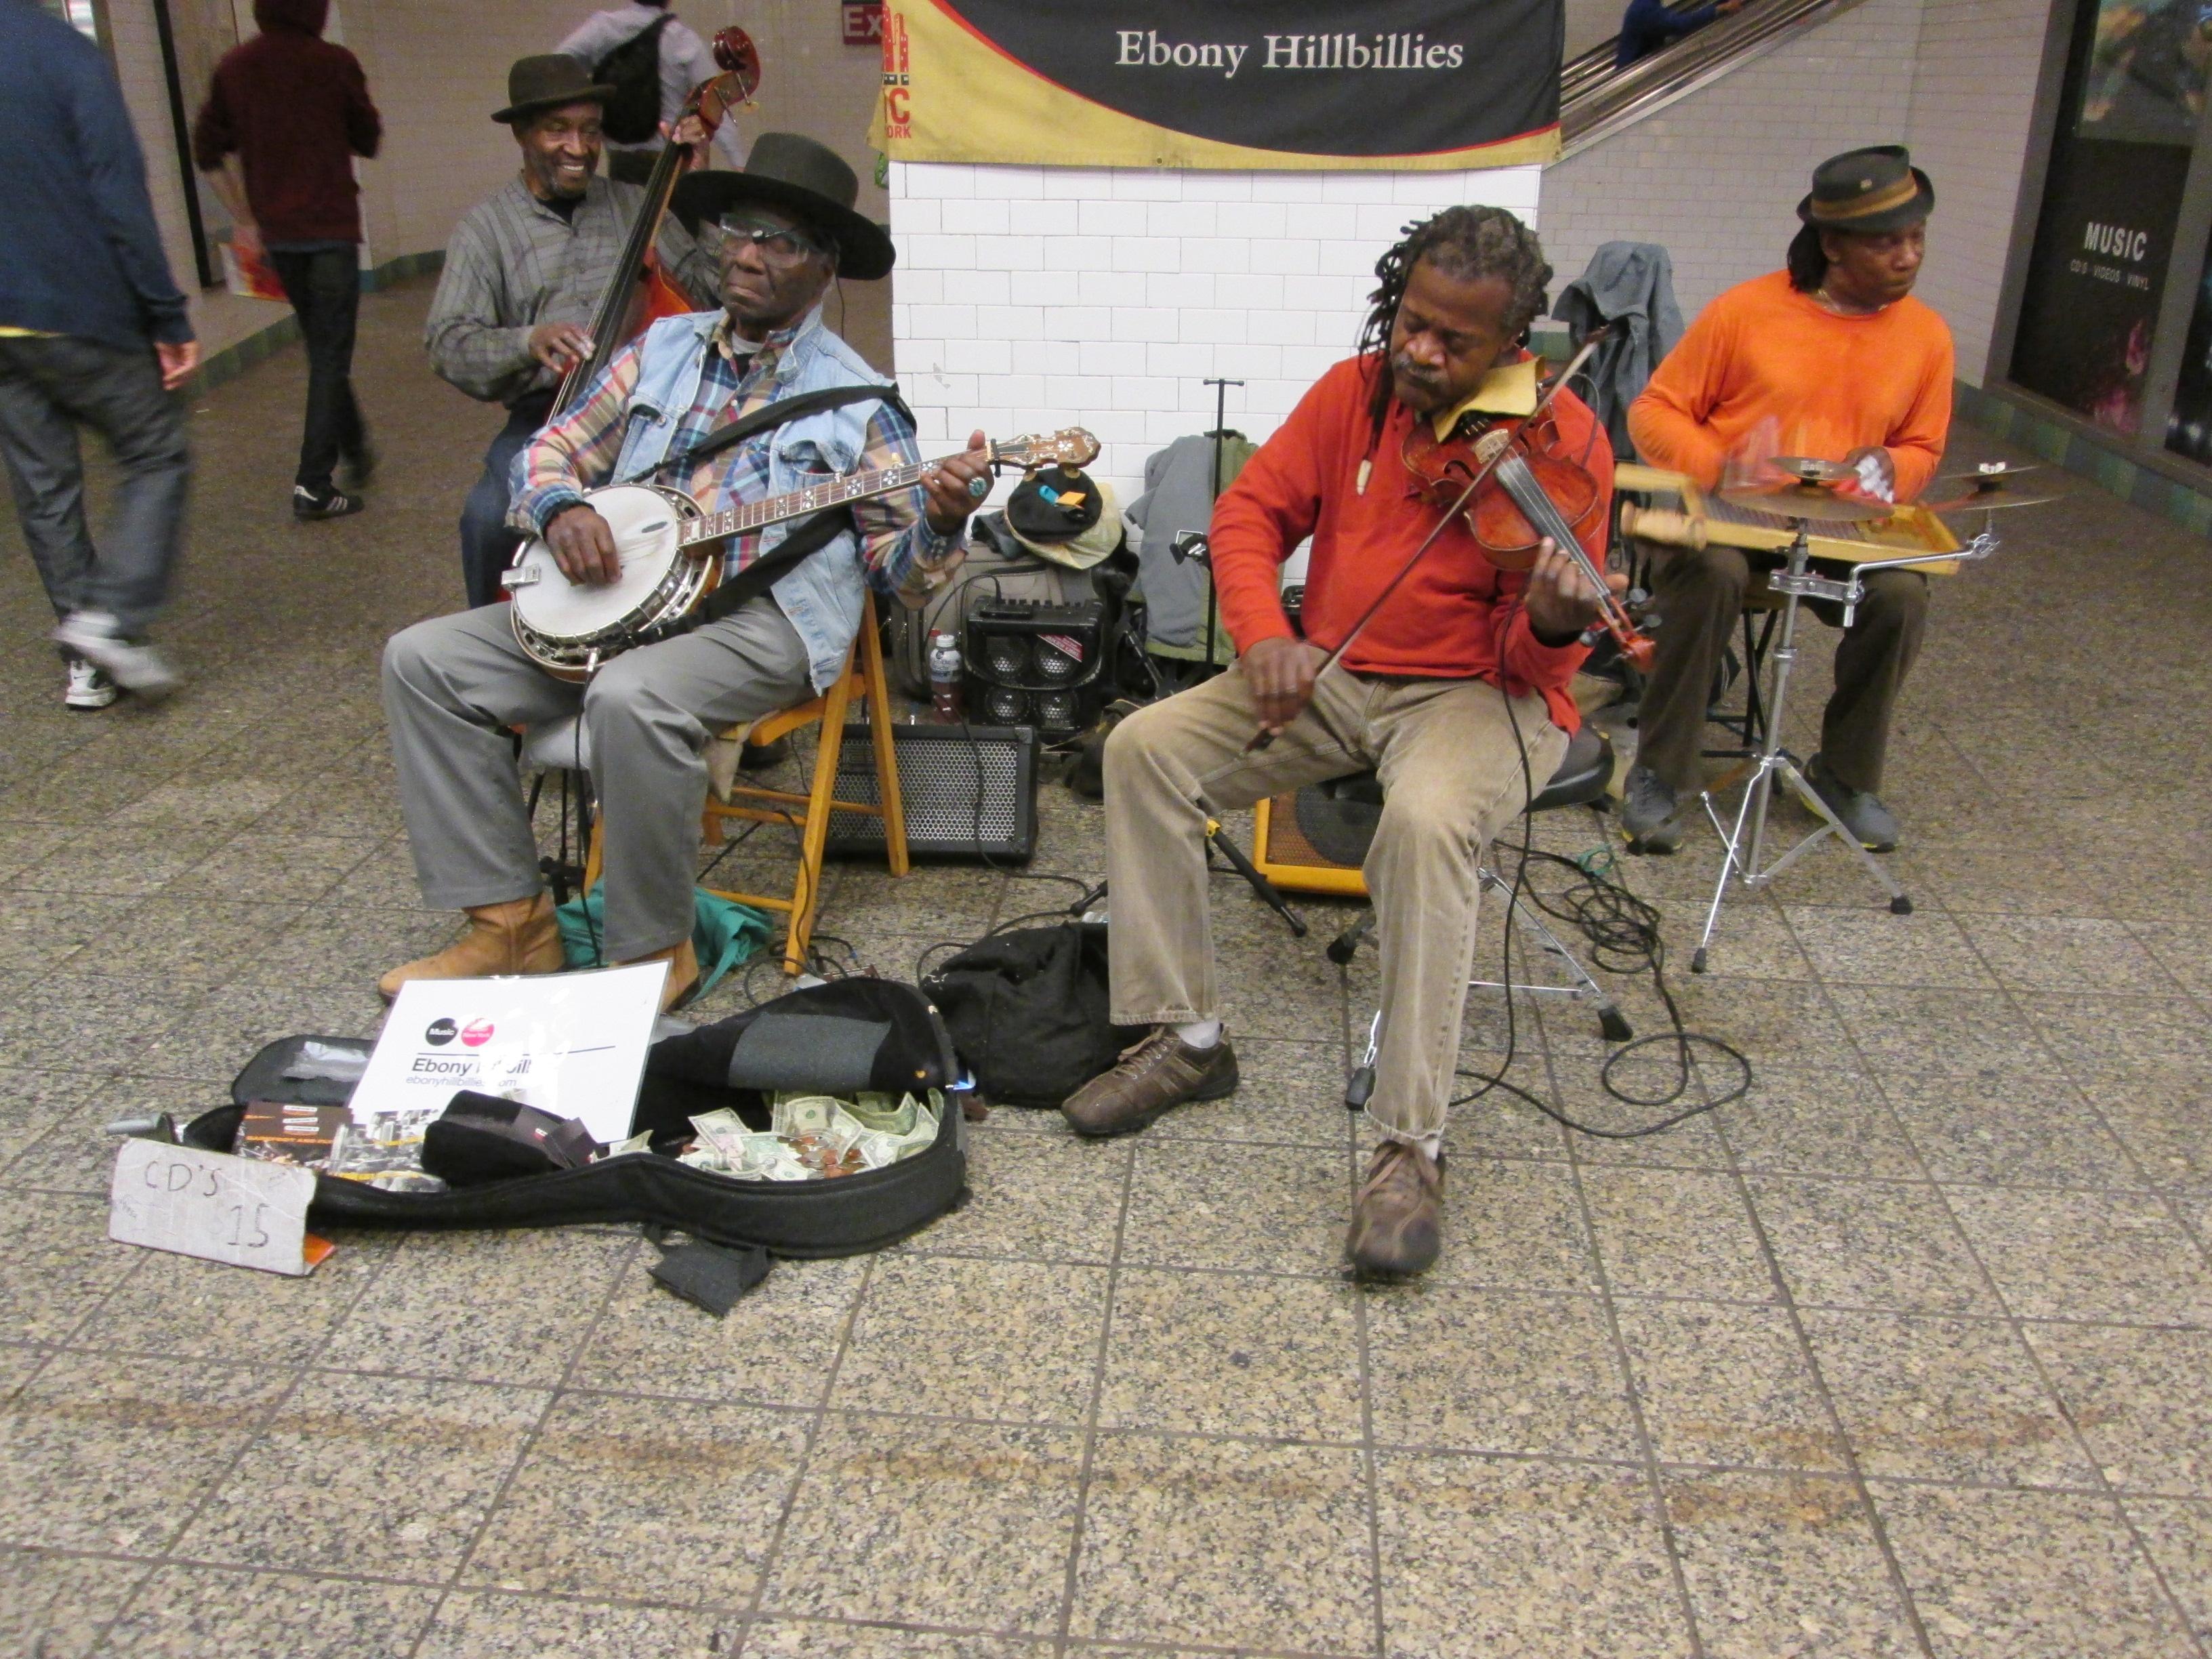 Ebony Hillbillies in Subway Beats